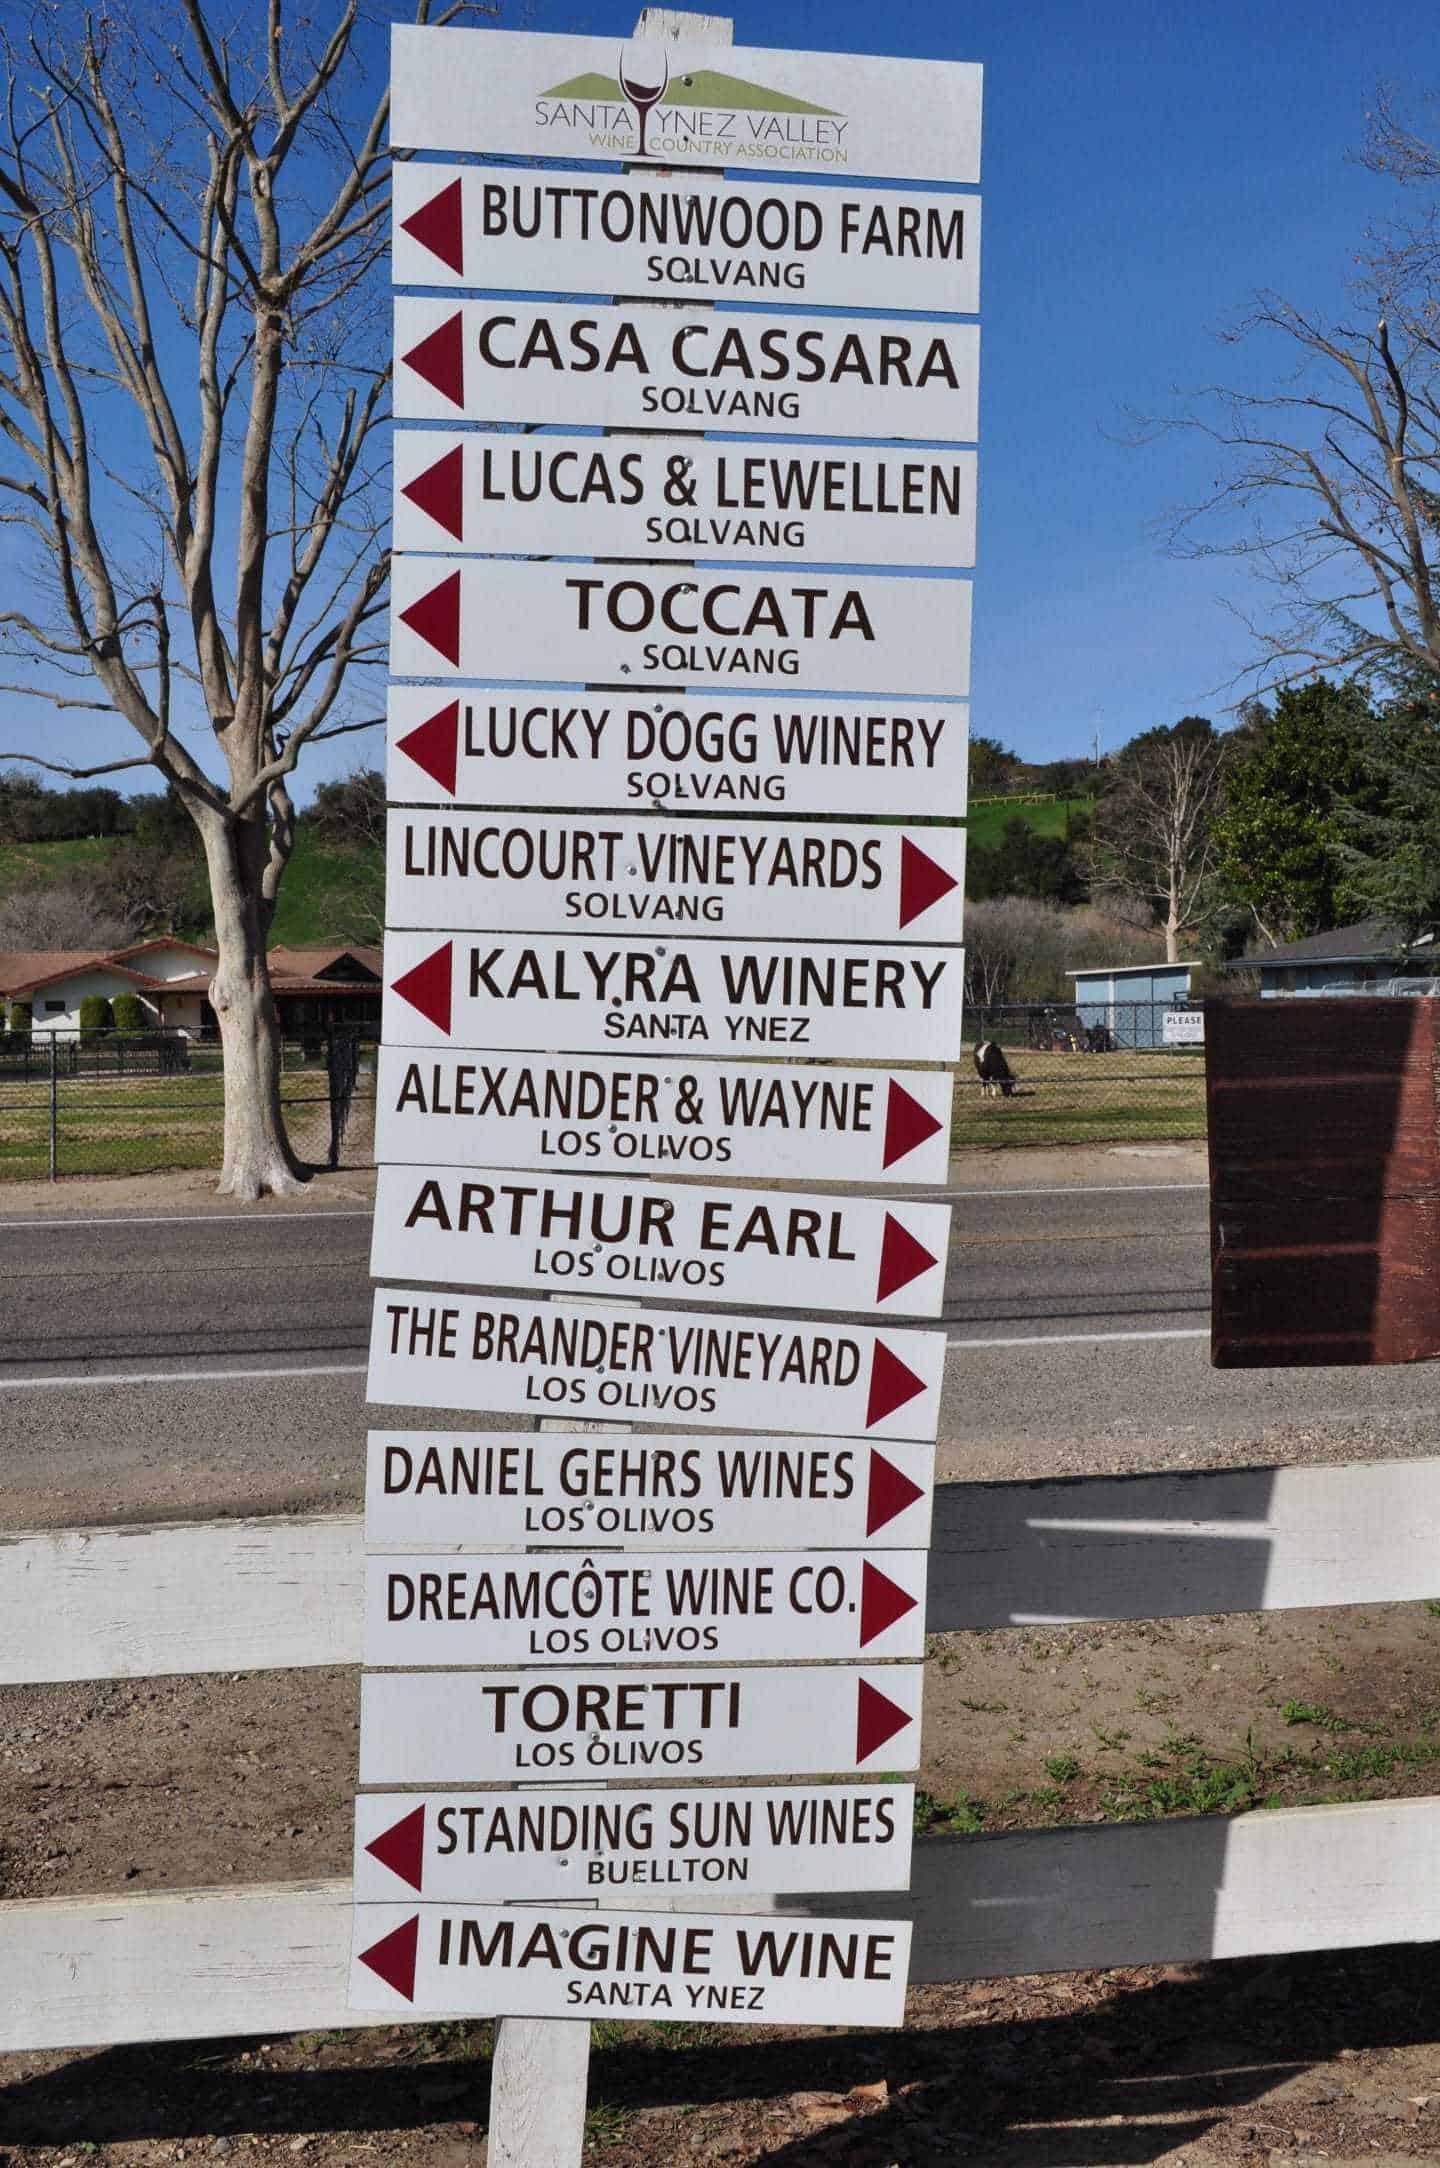 santa ynez valley winery list